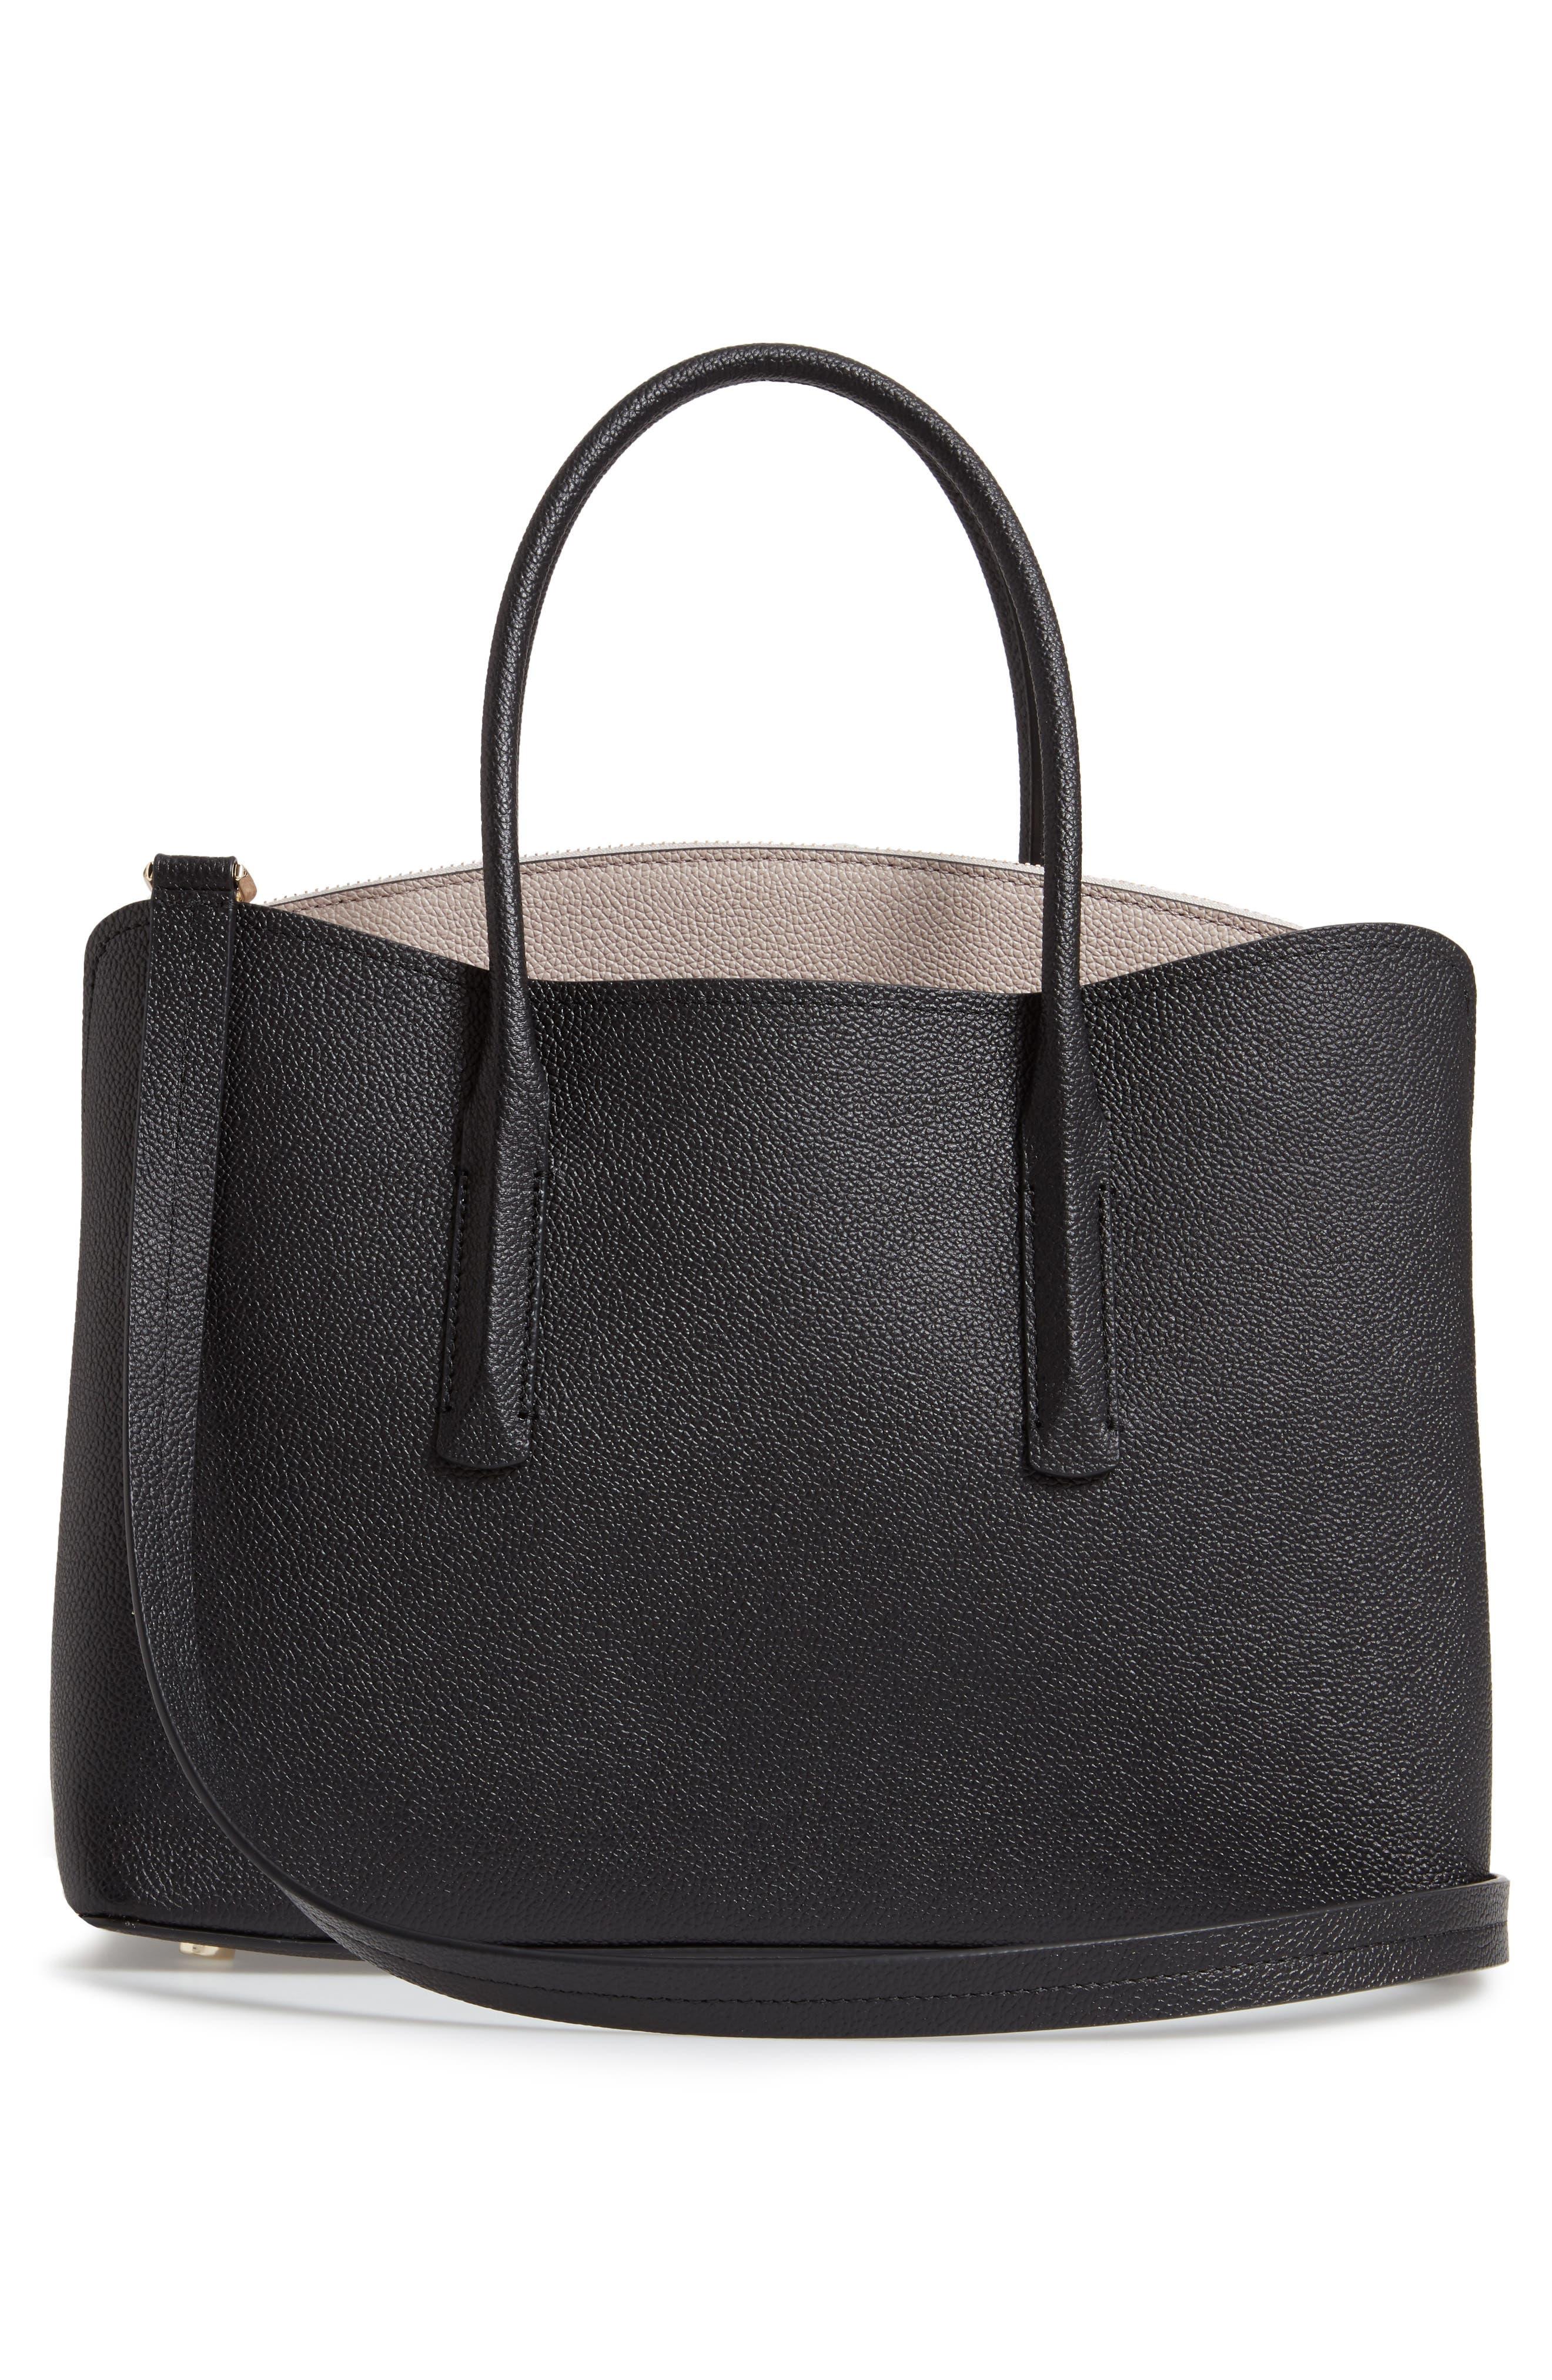 KATE SPADE NEW YORK, large margaux leather satchel, Alternate thumbnail 4, color, BLACK/ WARM TAUPE